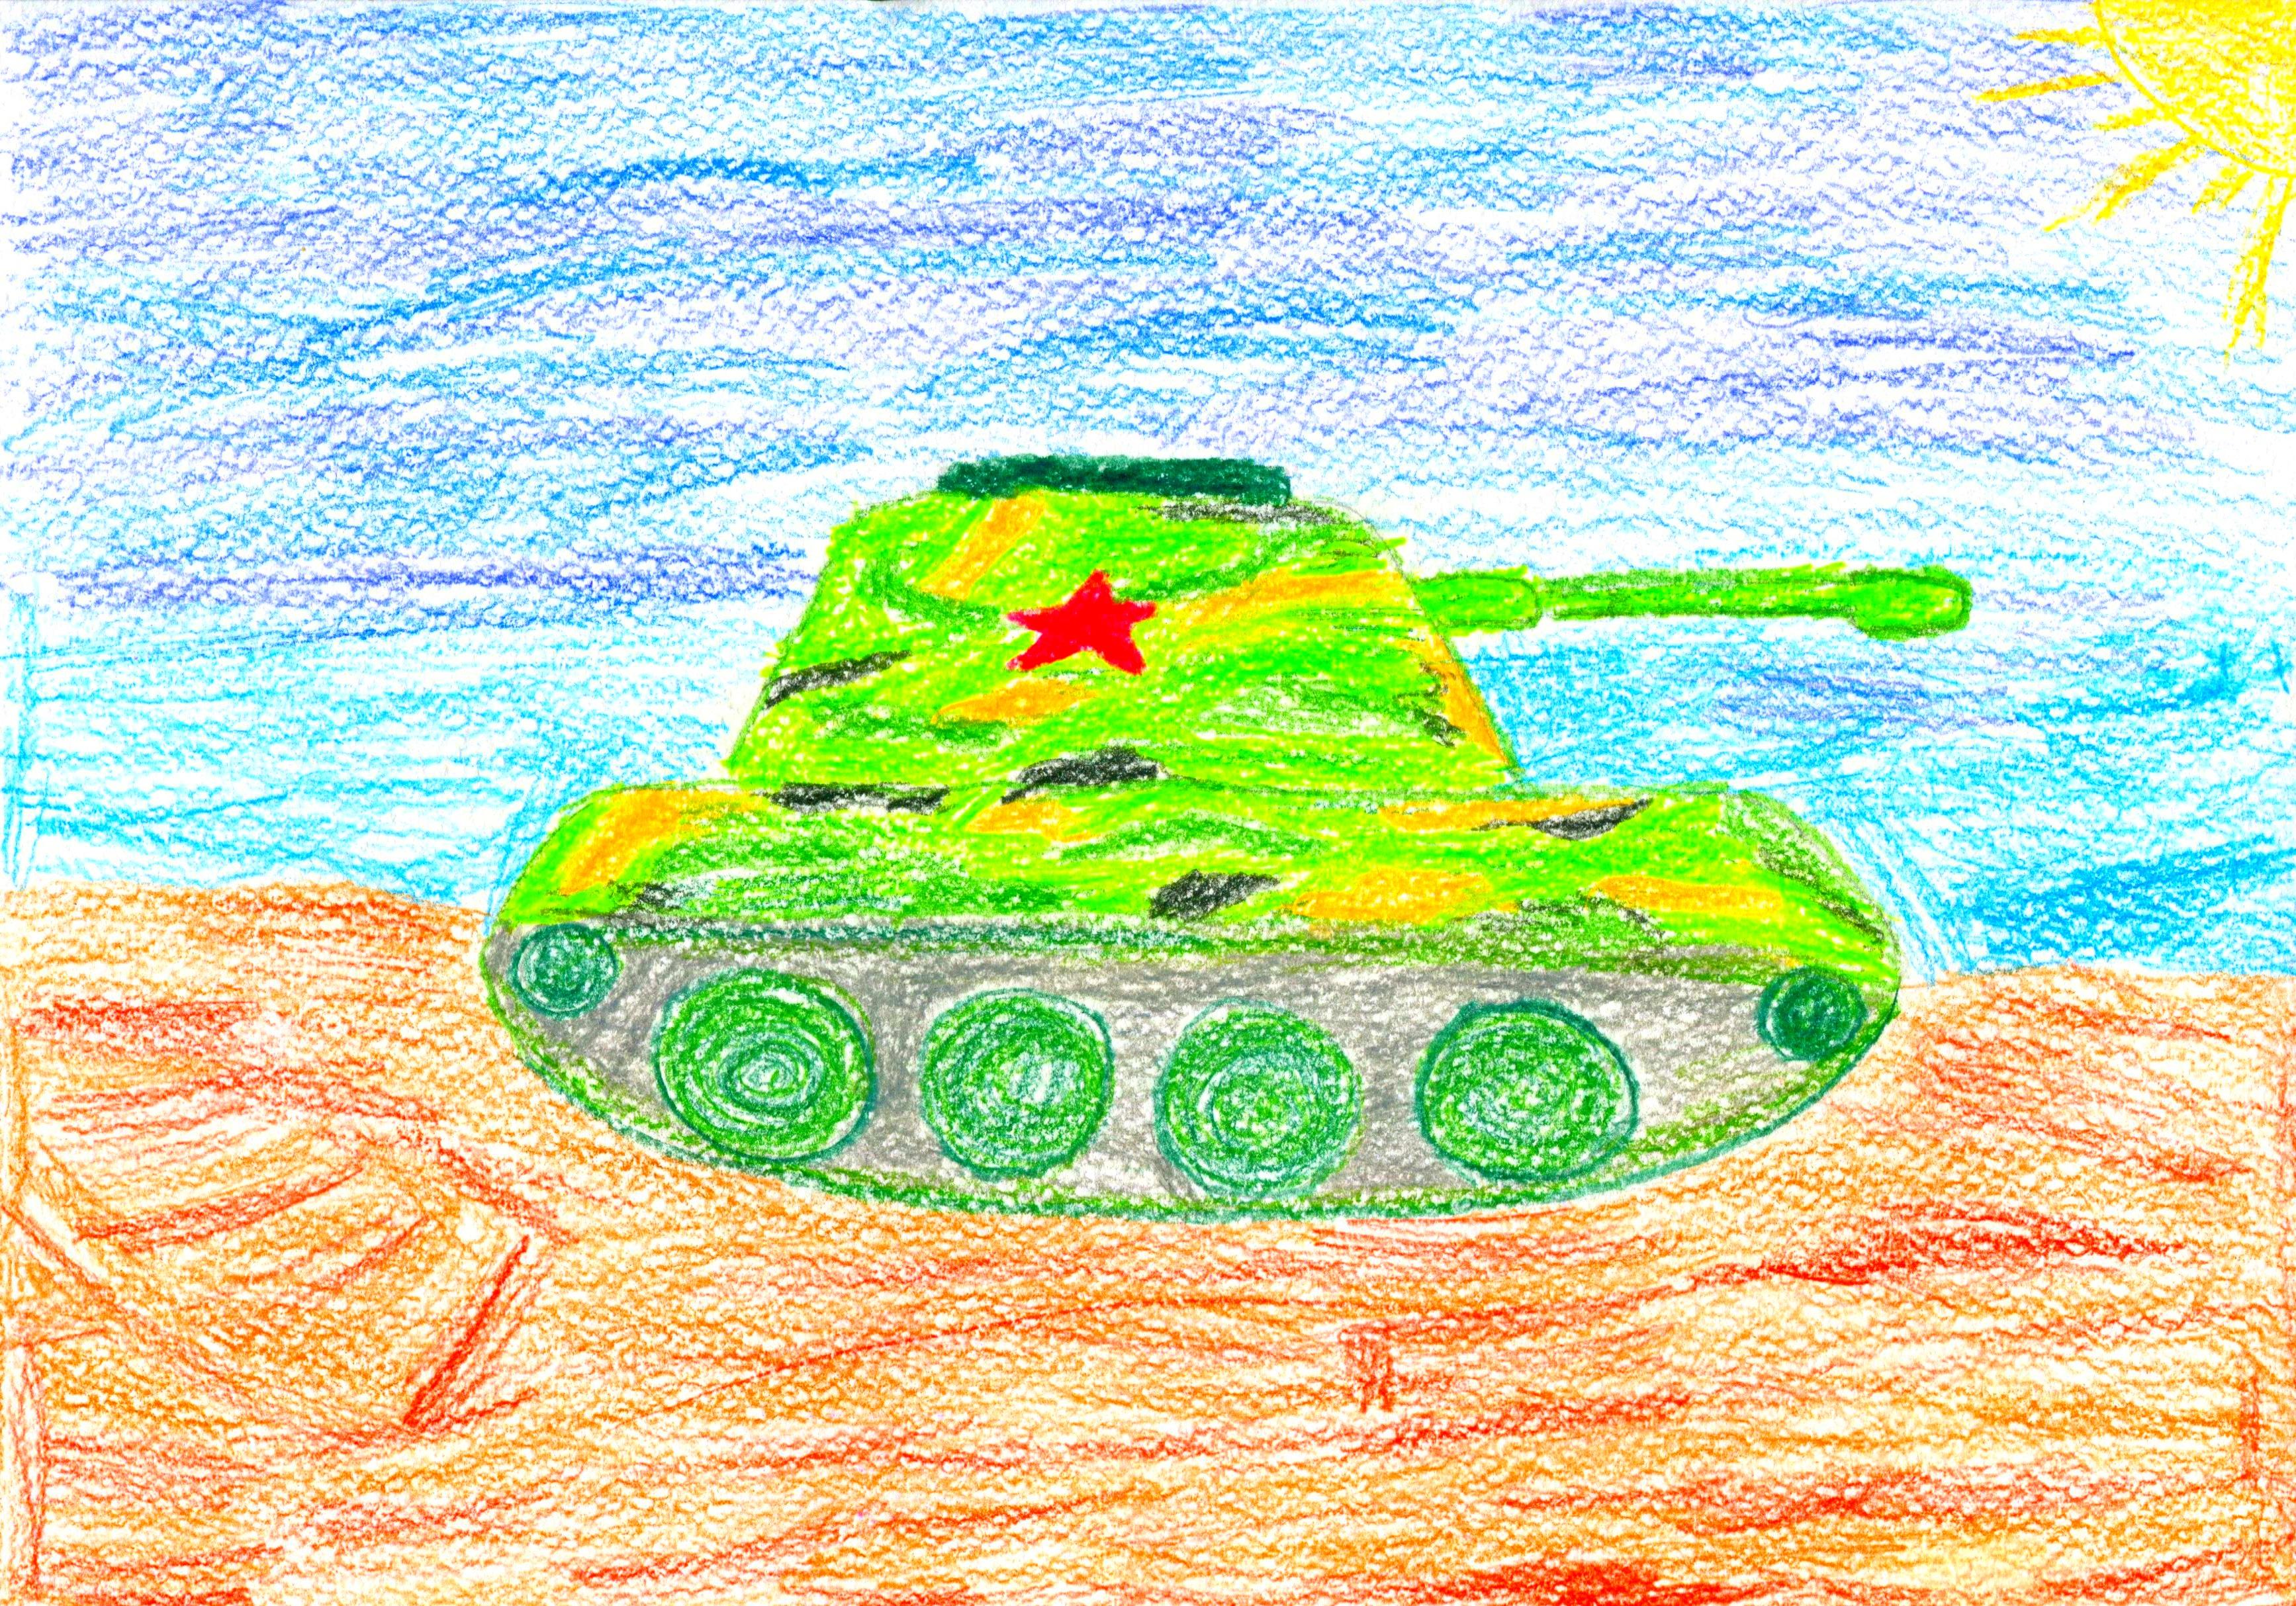 Картинки детские рисунки о войне, картинки